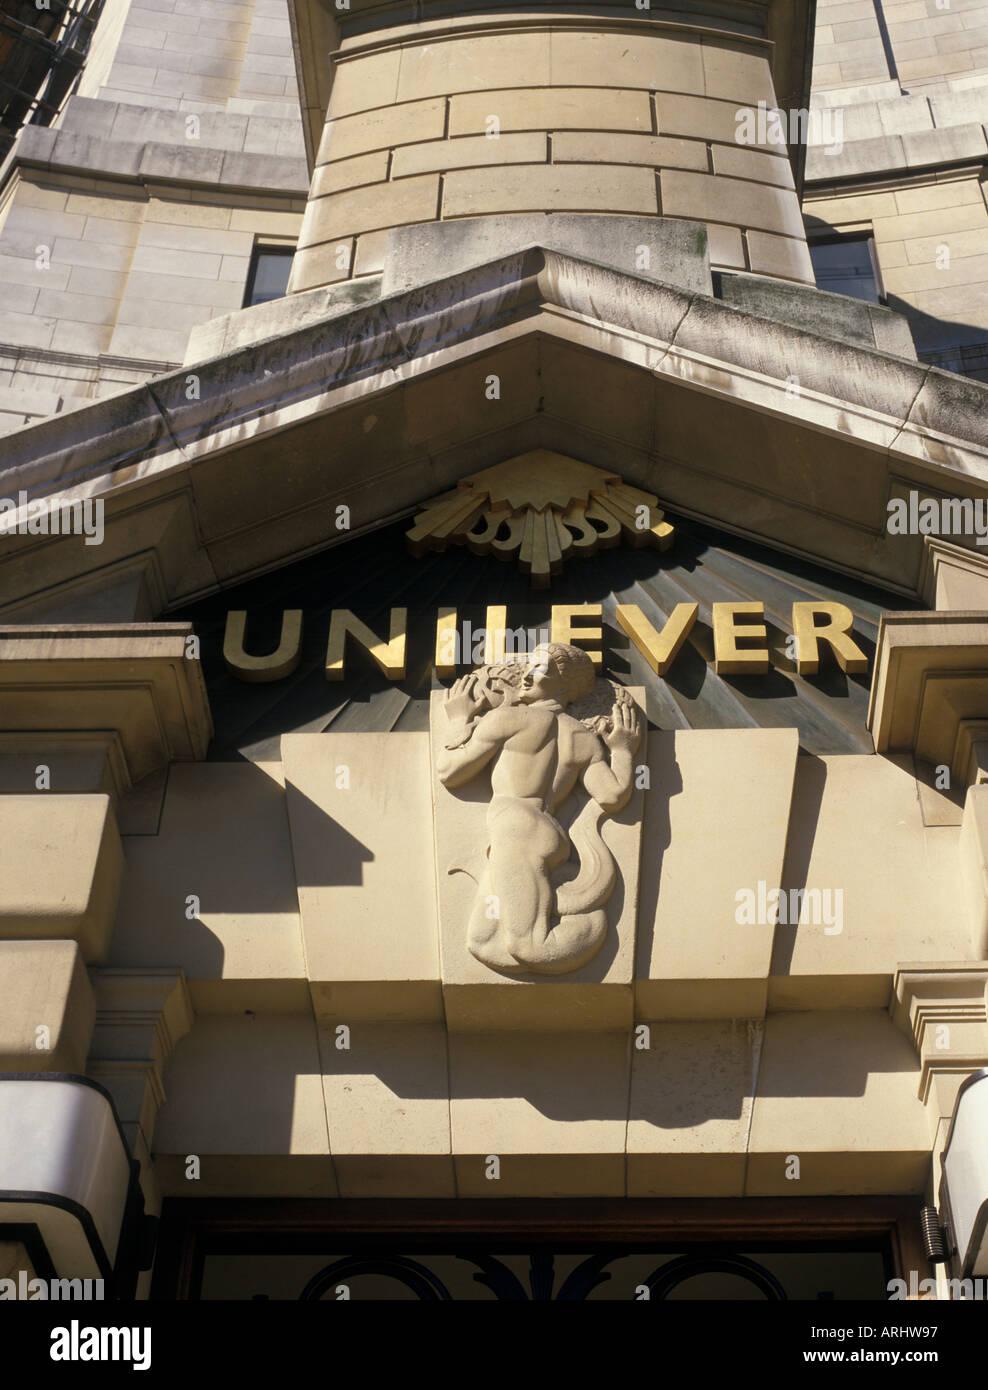 Allegorical sculpture on Unilever Building London England - Stock Image